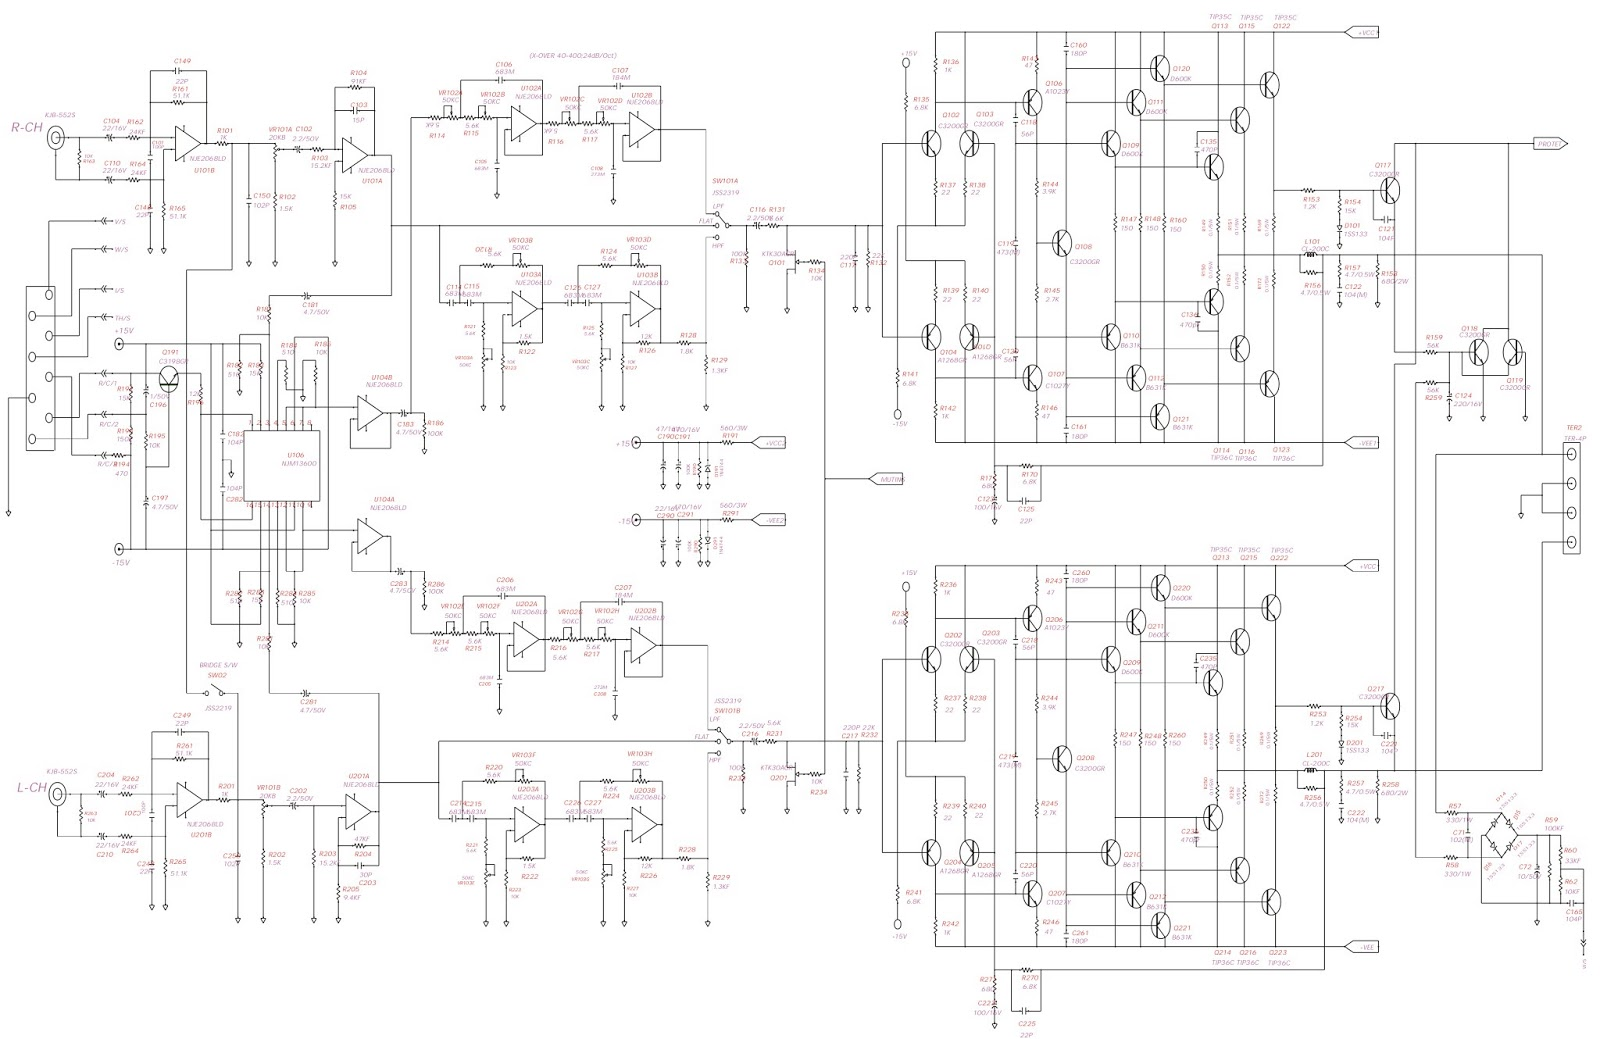 jbl a302gti car amp wiring diagram schematic diagram controls